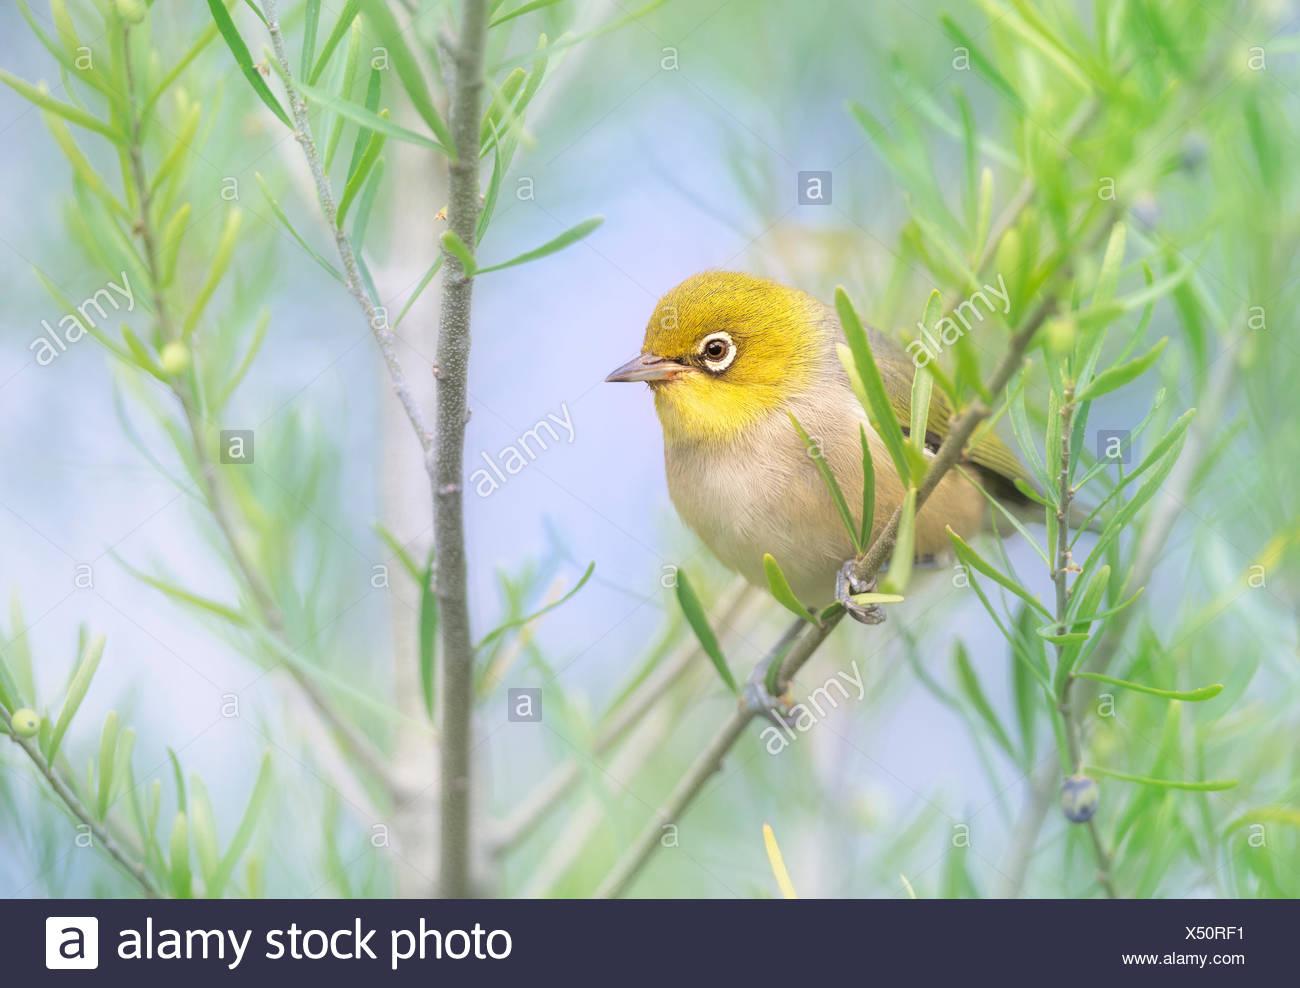 Silvereye (Zosterops lateralis) bird perched on branch, Melbourne, Victoria, Australia - Stock Image